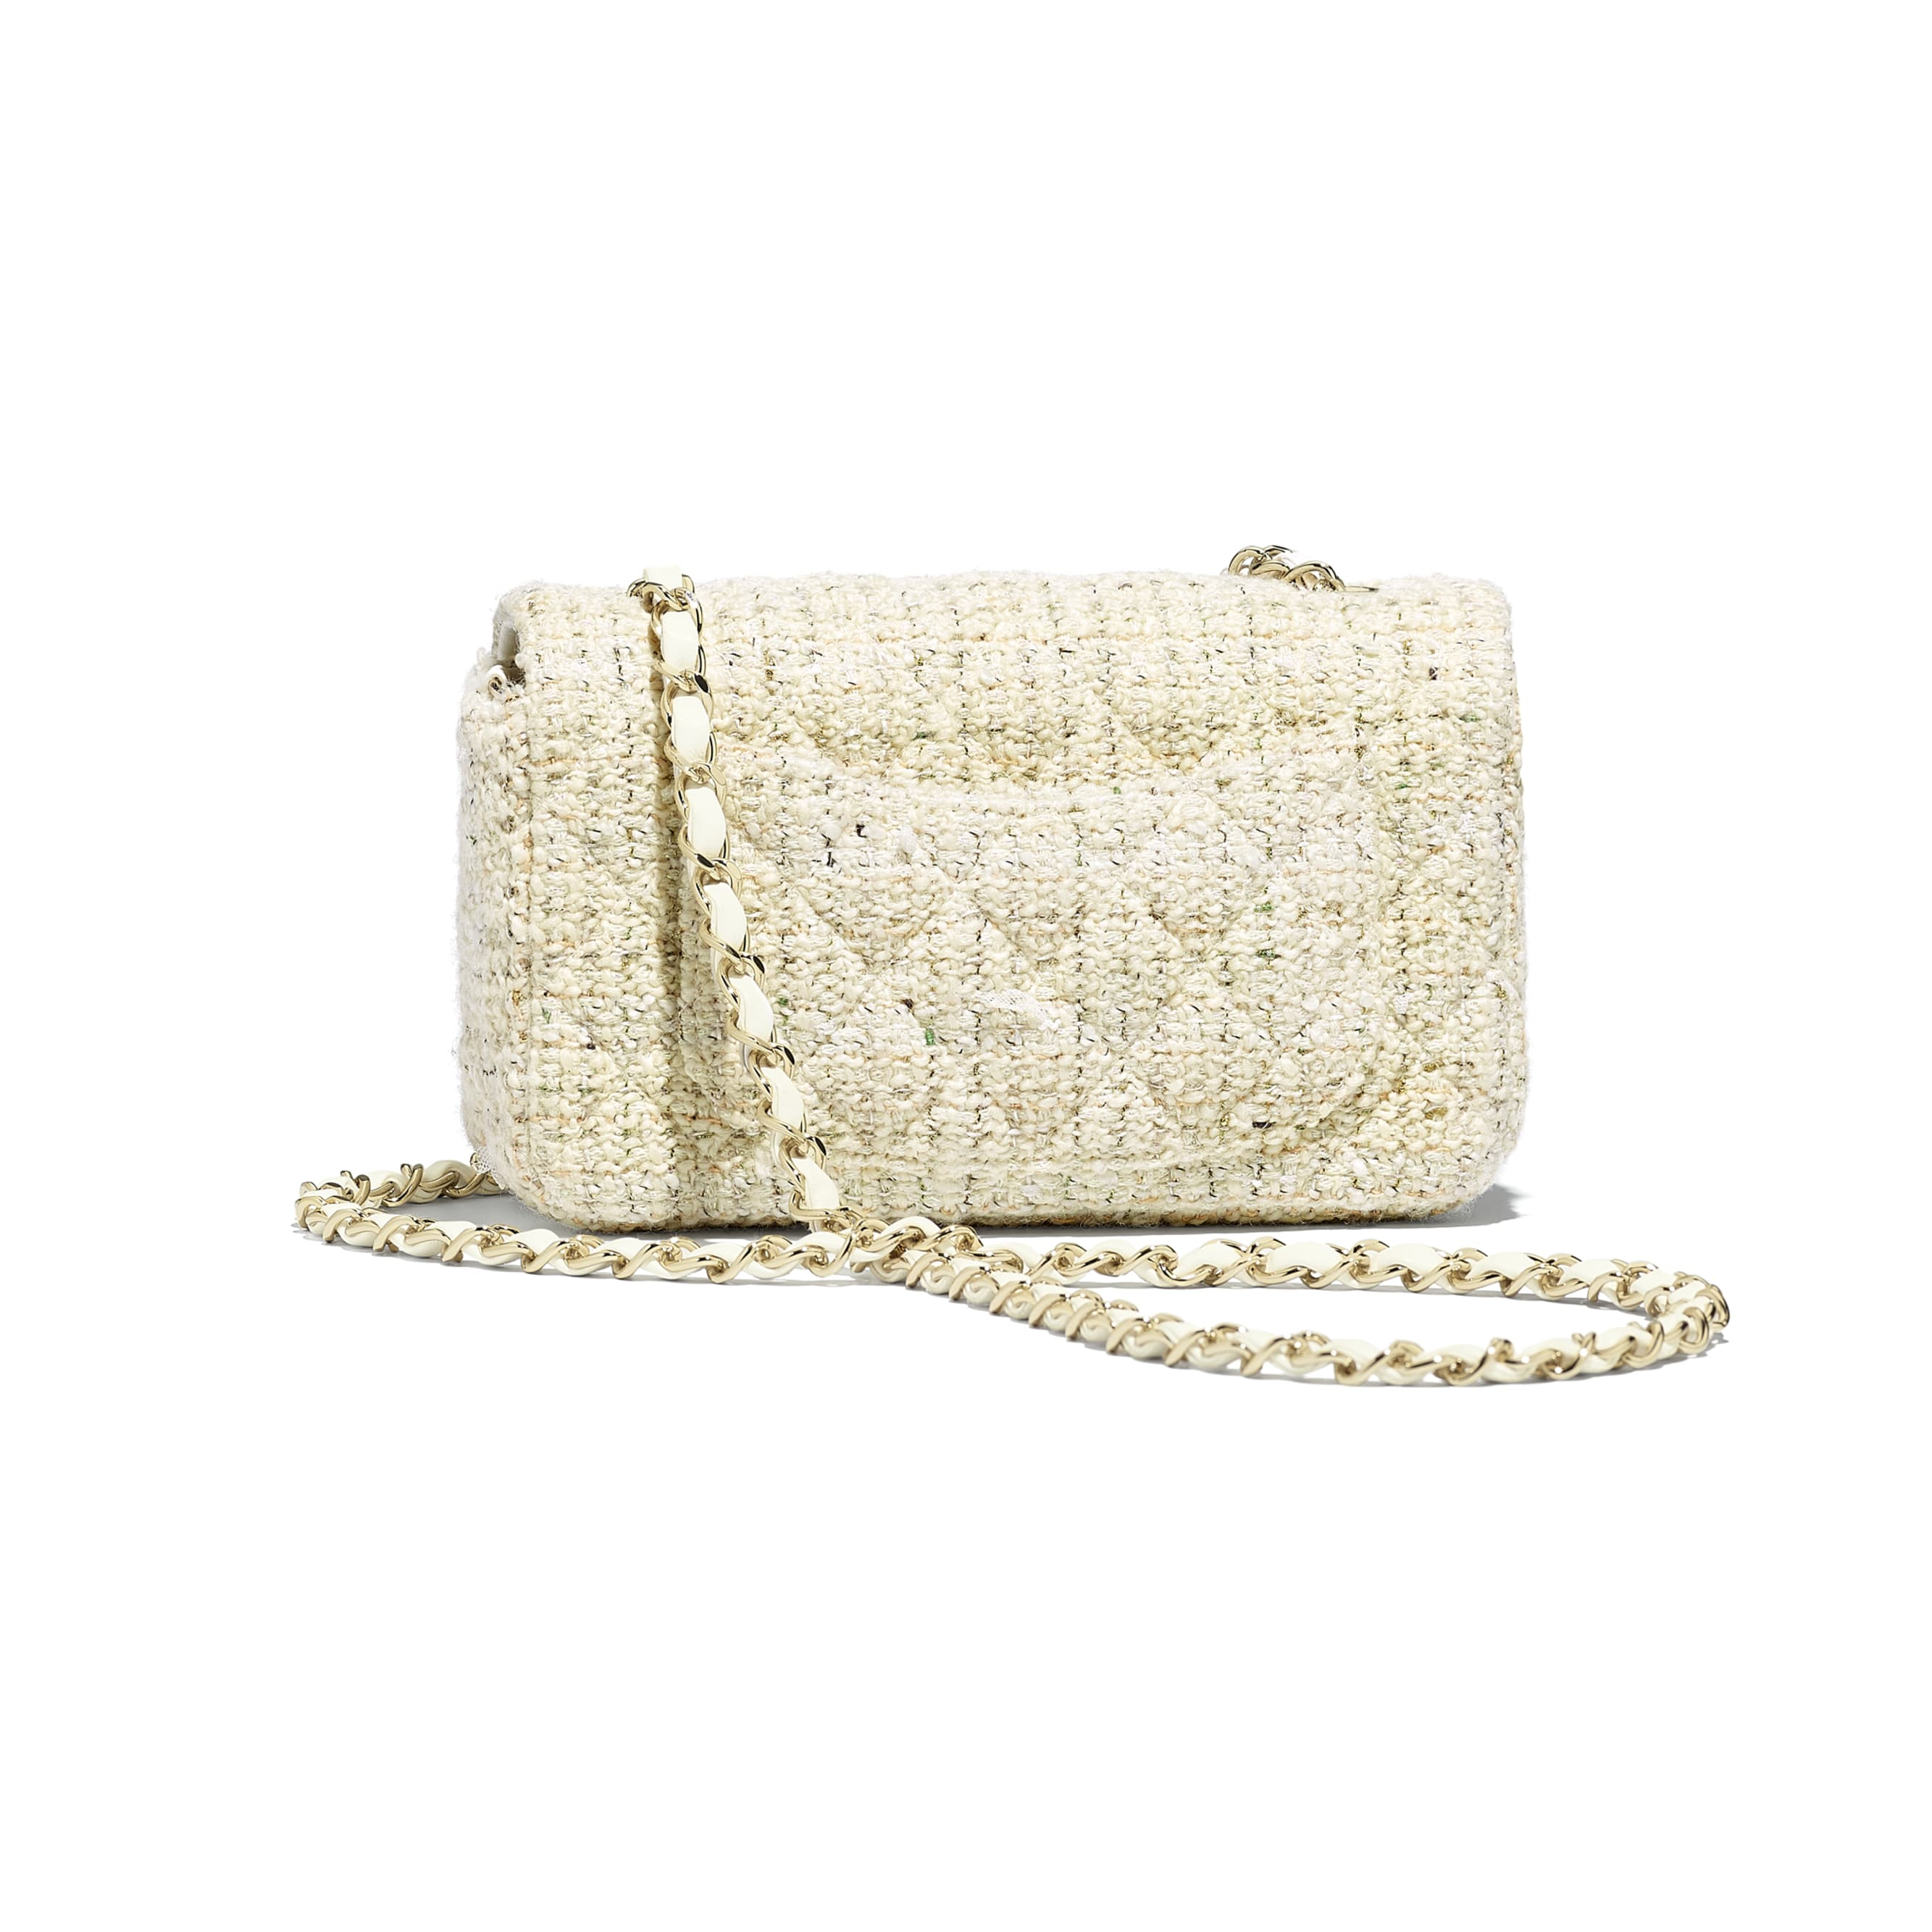 Mini Flap Bag - Ecru, white, green & gold - Tweed & Gold-Tone Metal - Alternative view - see standard sized version